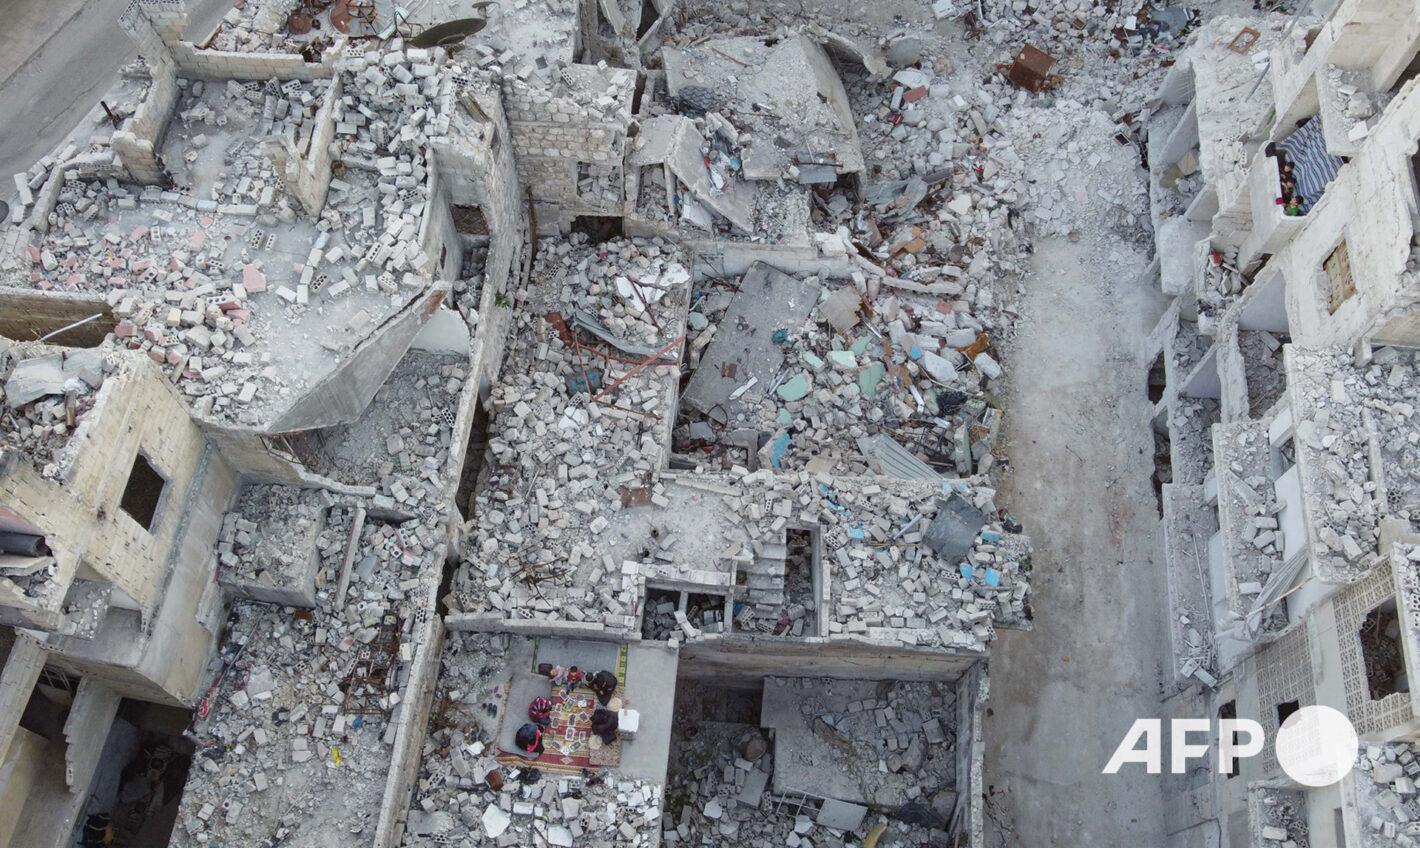 AFP 16 | Aaref WATAD 4 mai 2020 – Ariha (Syrie)